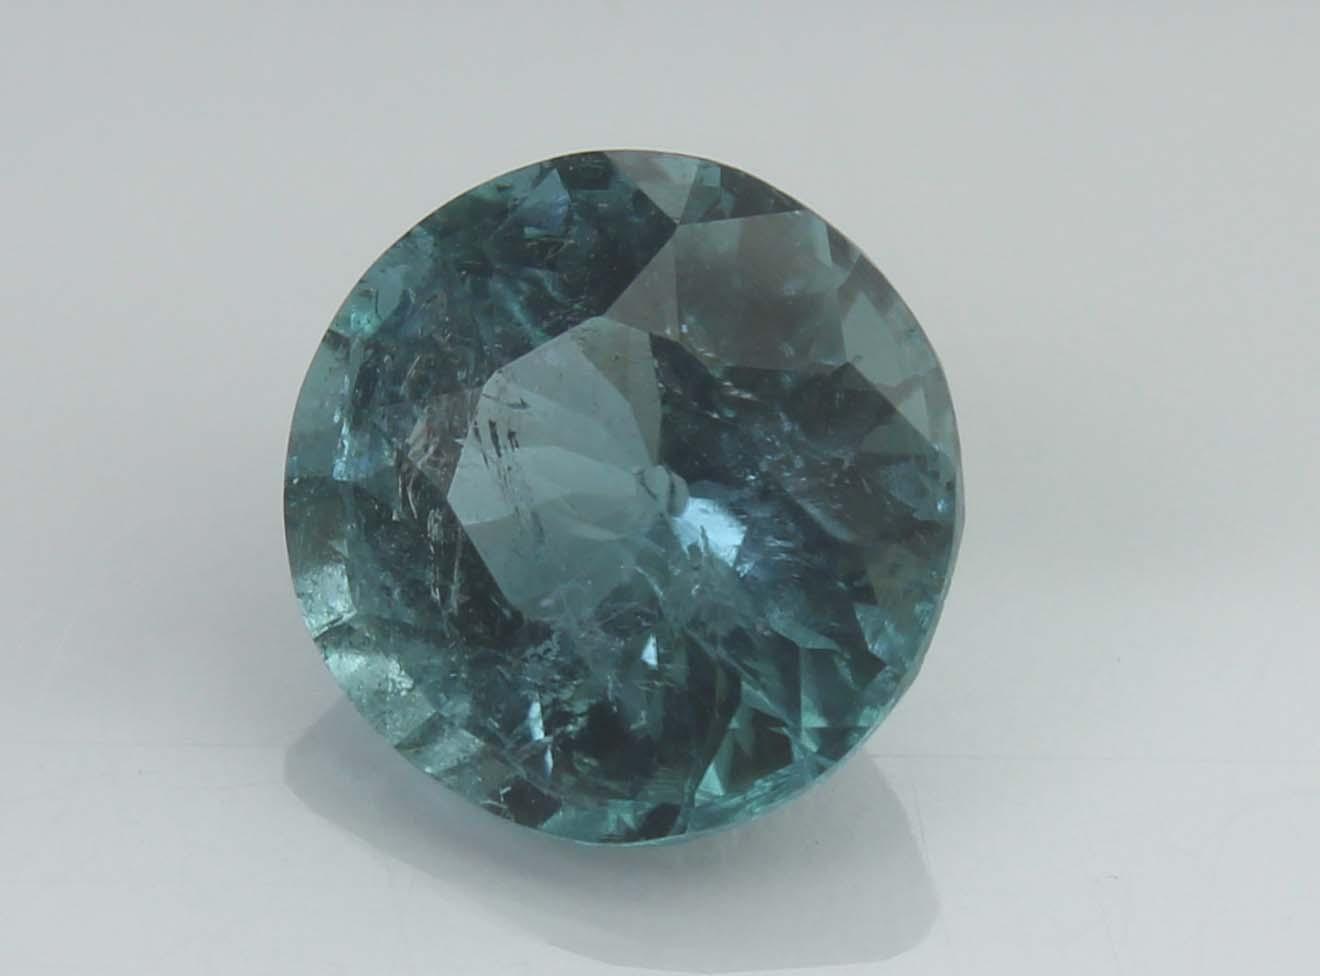 Blue Tourmaline, 2.37Ct - Image 4 of 6